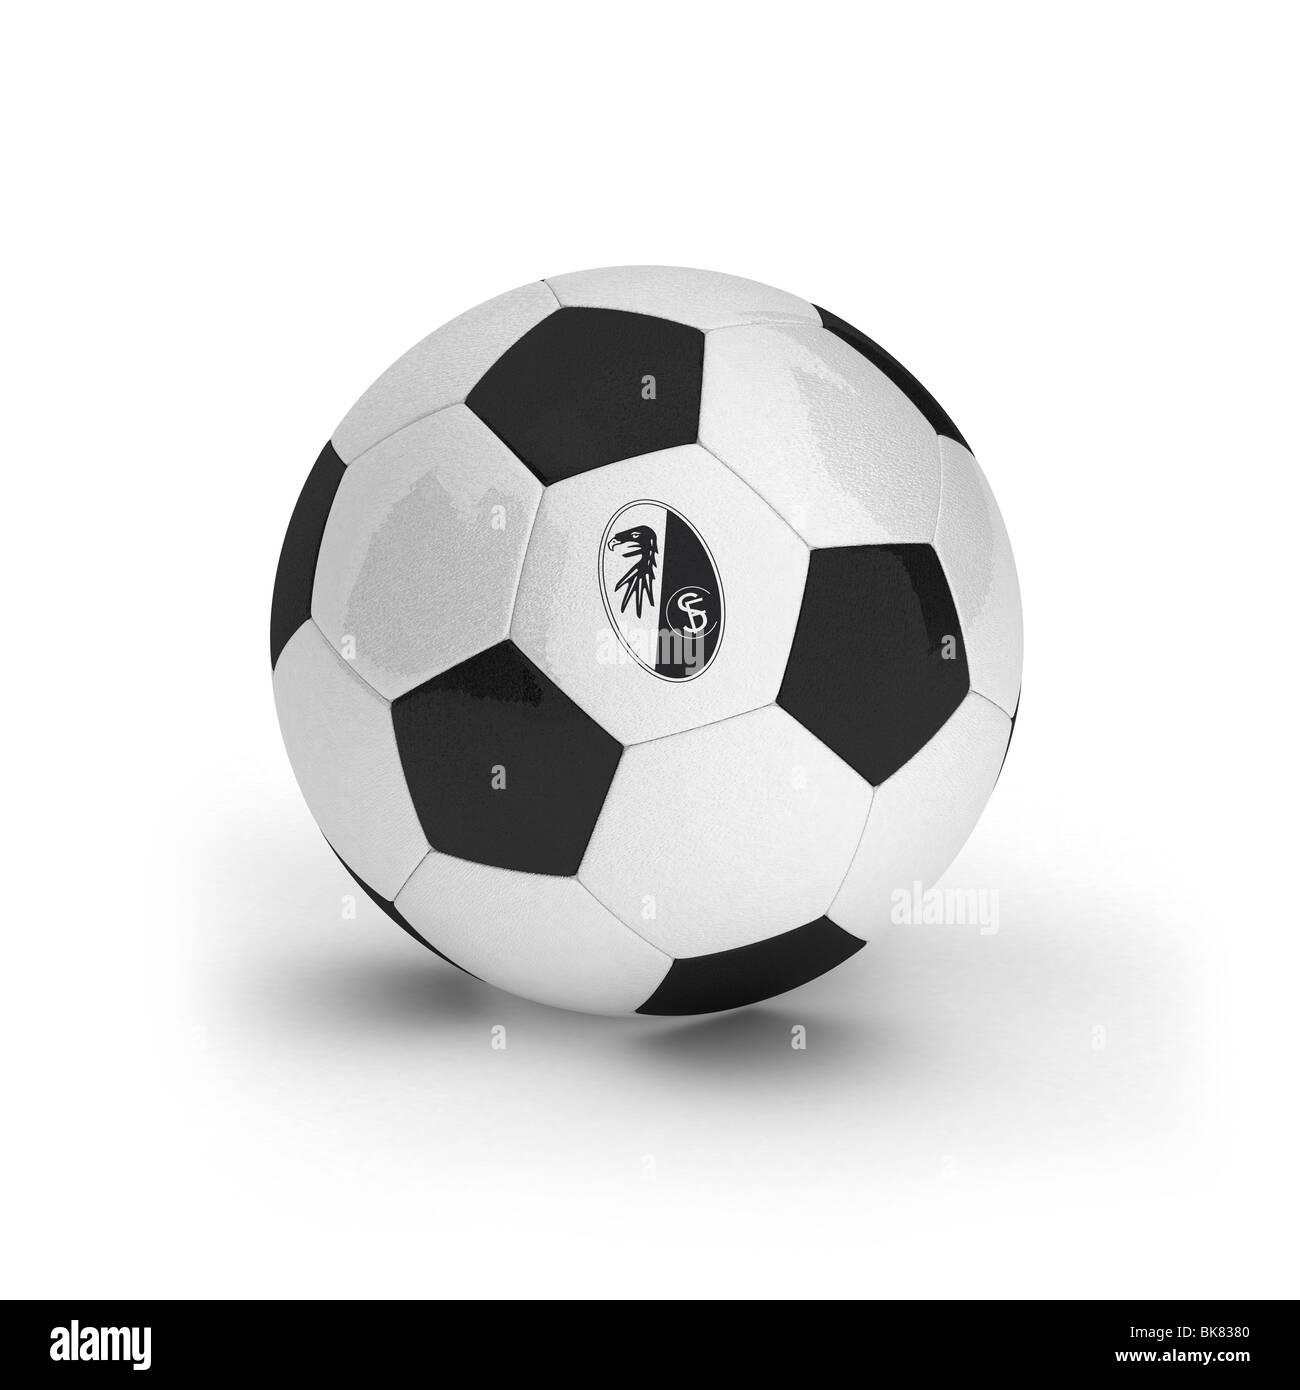 SC Freiburg emblem on a soccer ball - Stock Image